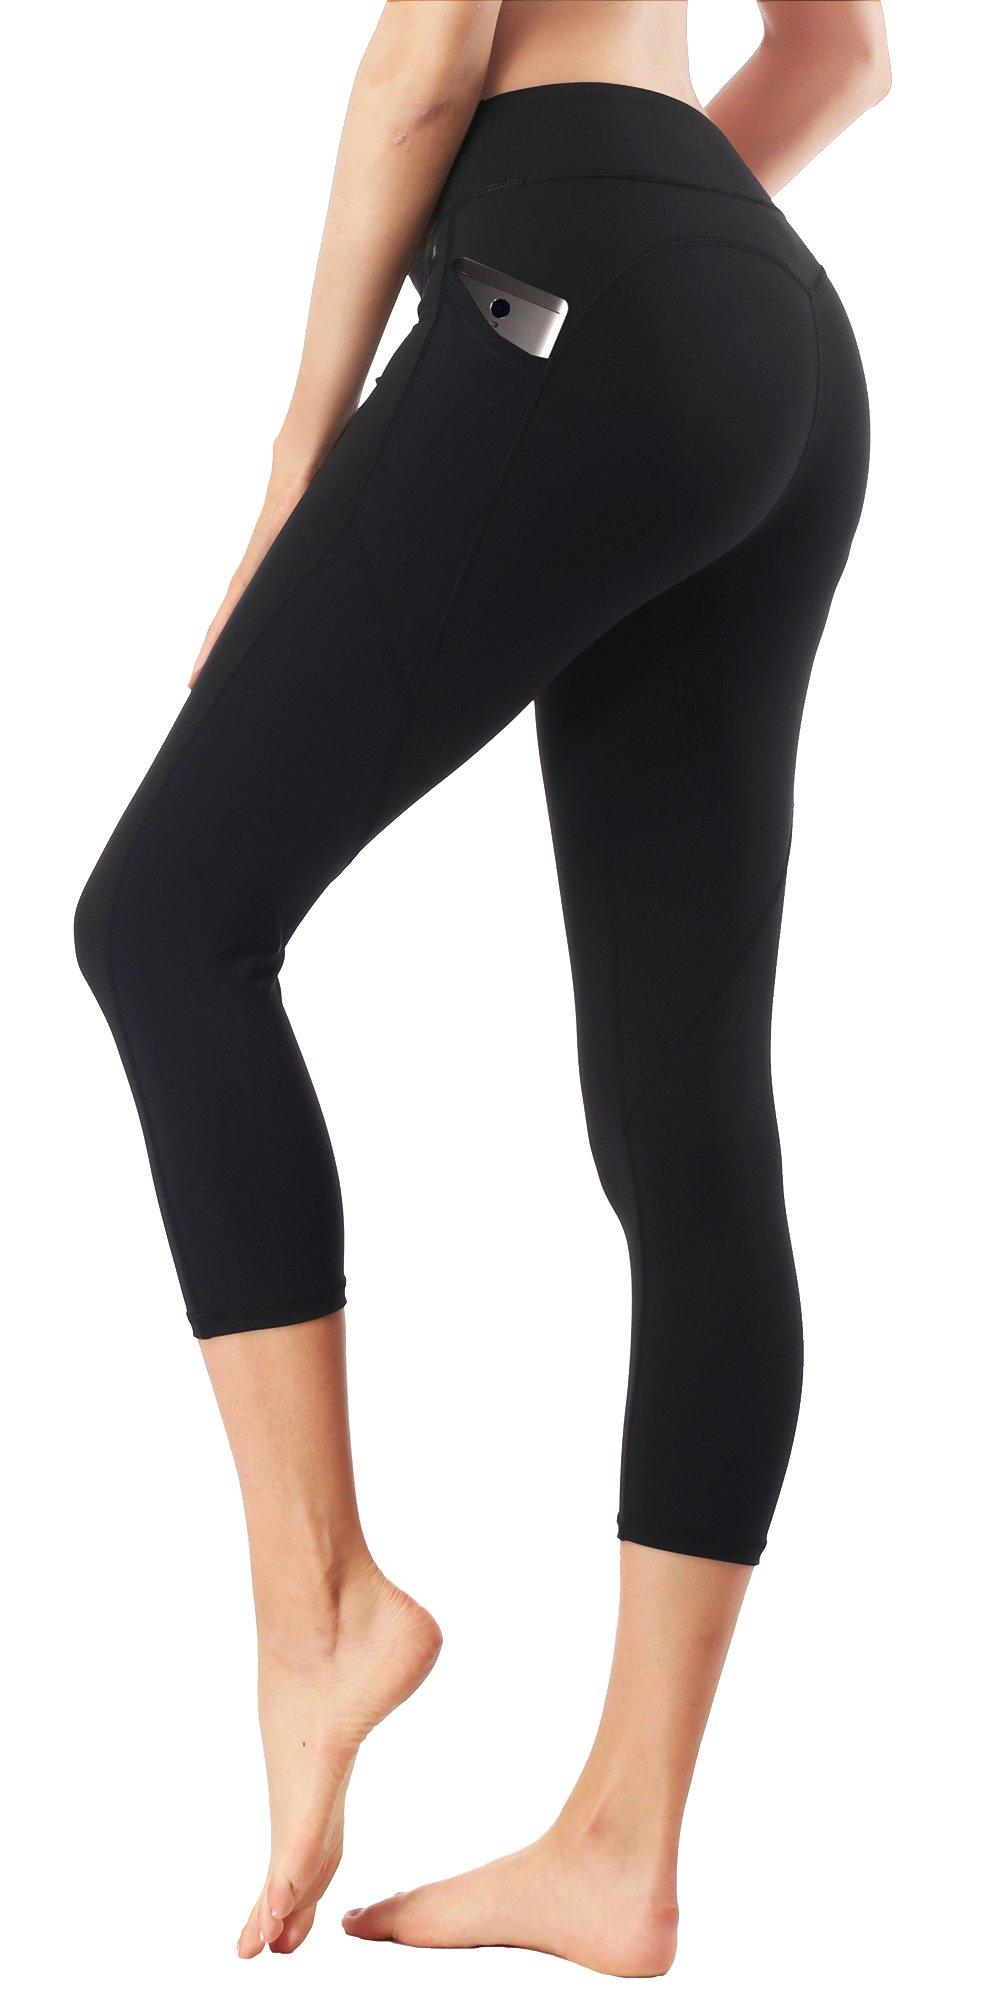 Dragon Fit Pockets Yoga Capri Workout Pants Tummy Control 4 Way Stretch Compression Running Yoga Capri Leggings